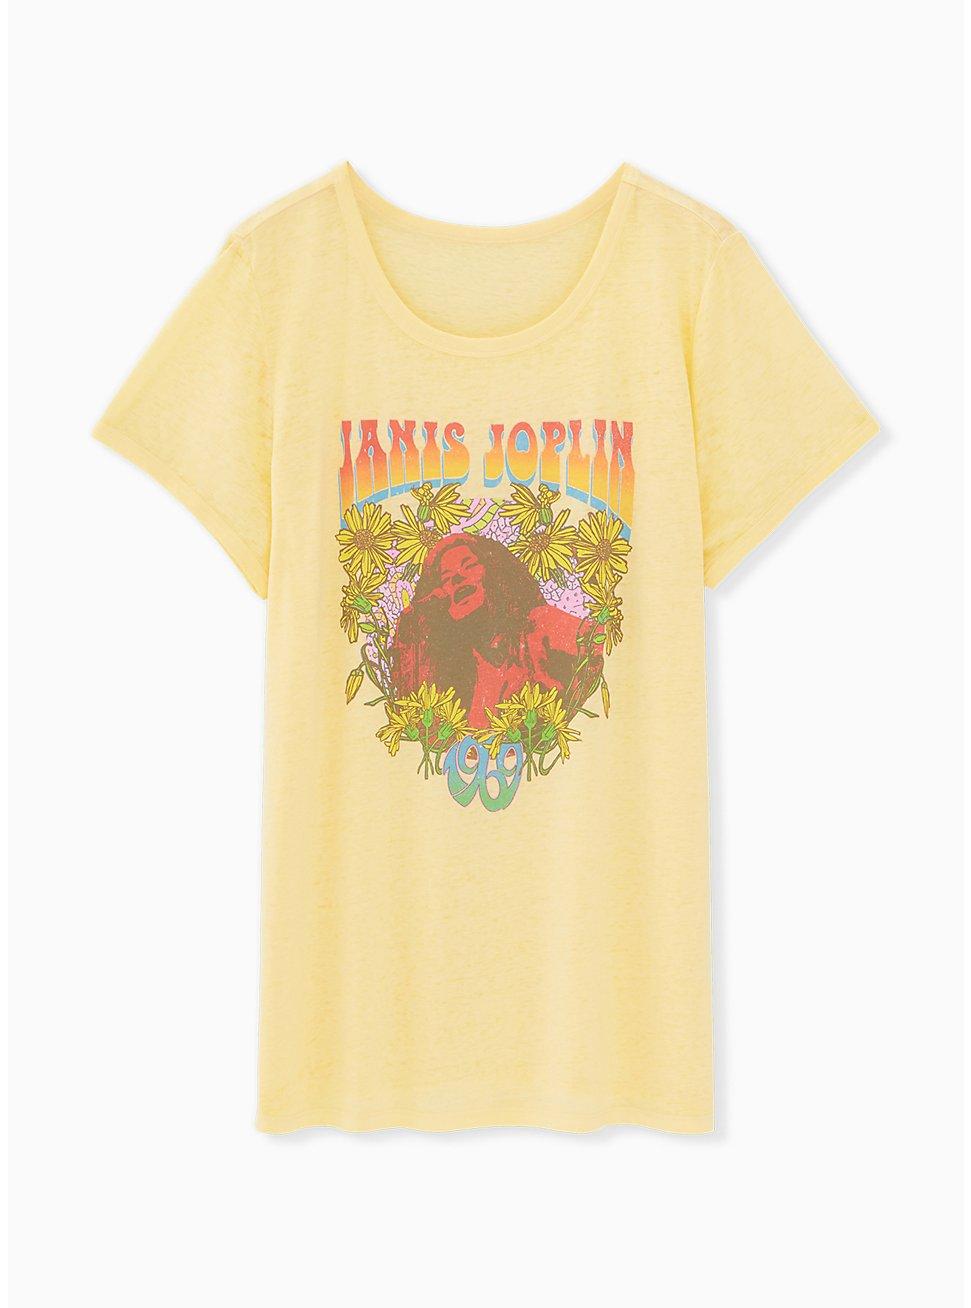 Janis Joplin Burnout Yellow Ringer Tee, , hi-res